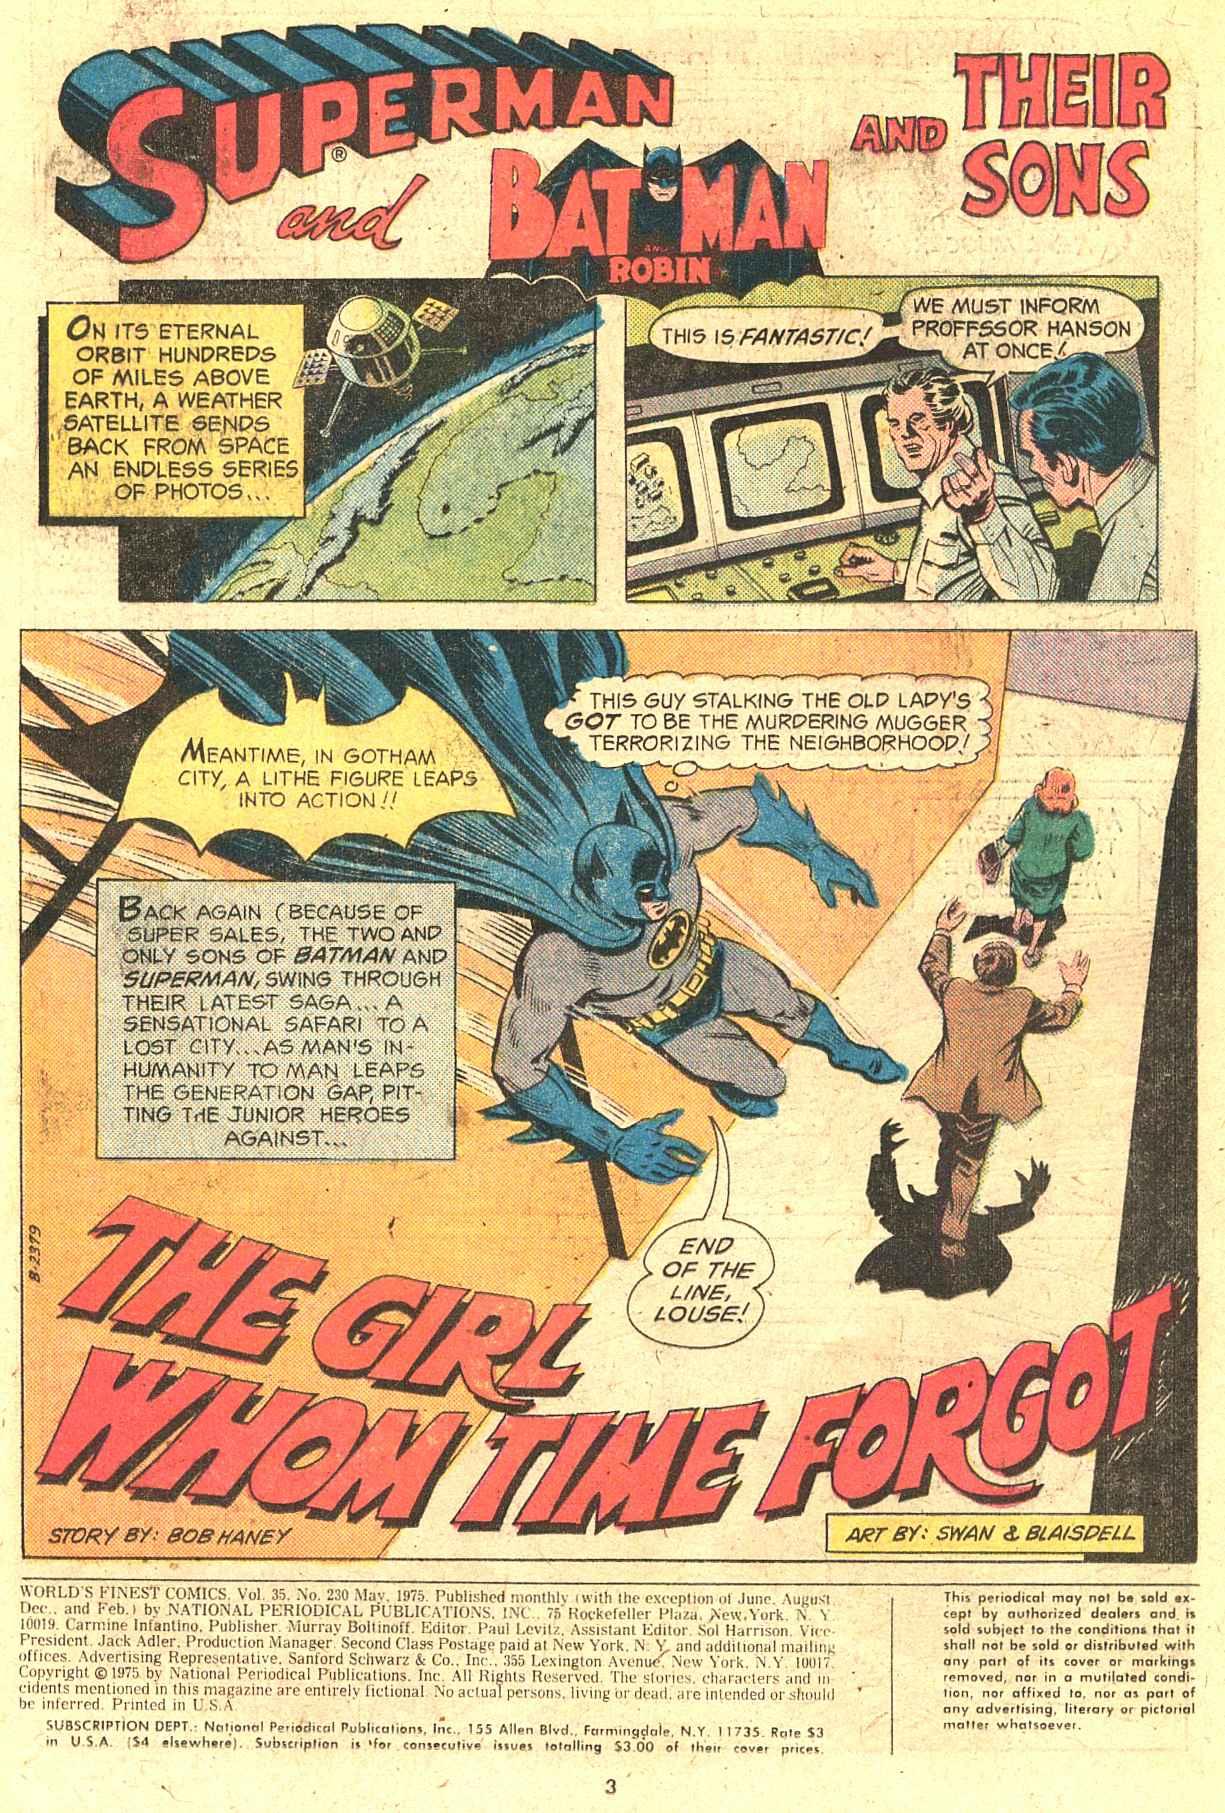 Read online World's Finest Comics comic -  Issue #230 - 3